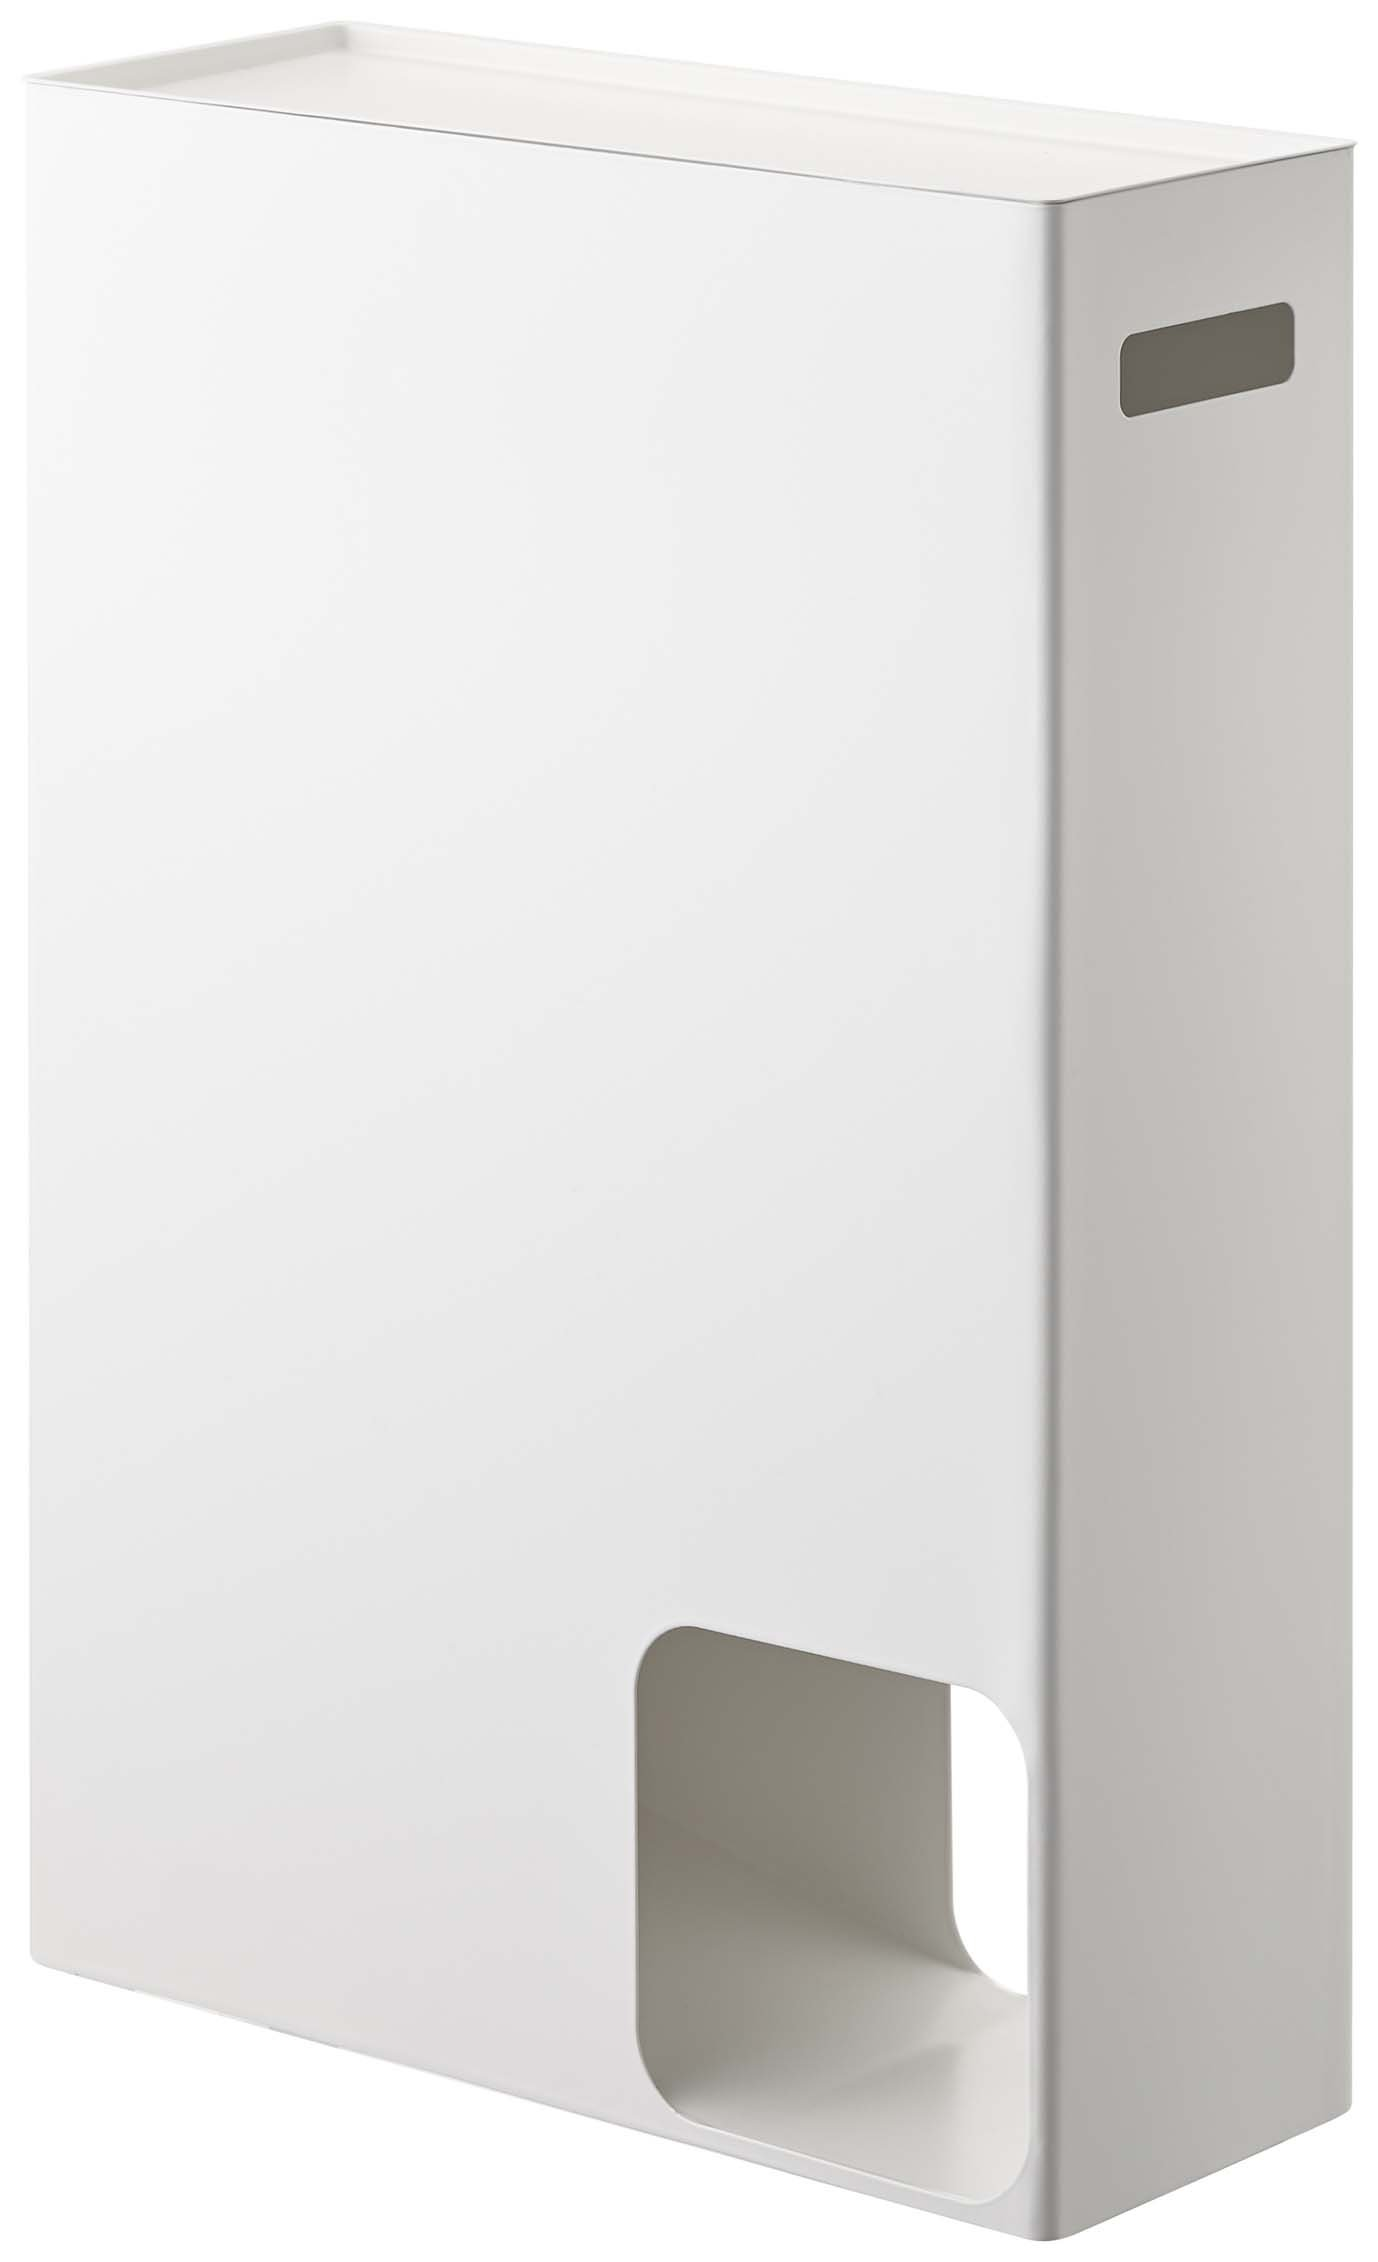 YAMAZAKI home Plate Toilet Paper Stocker